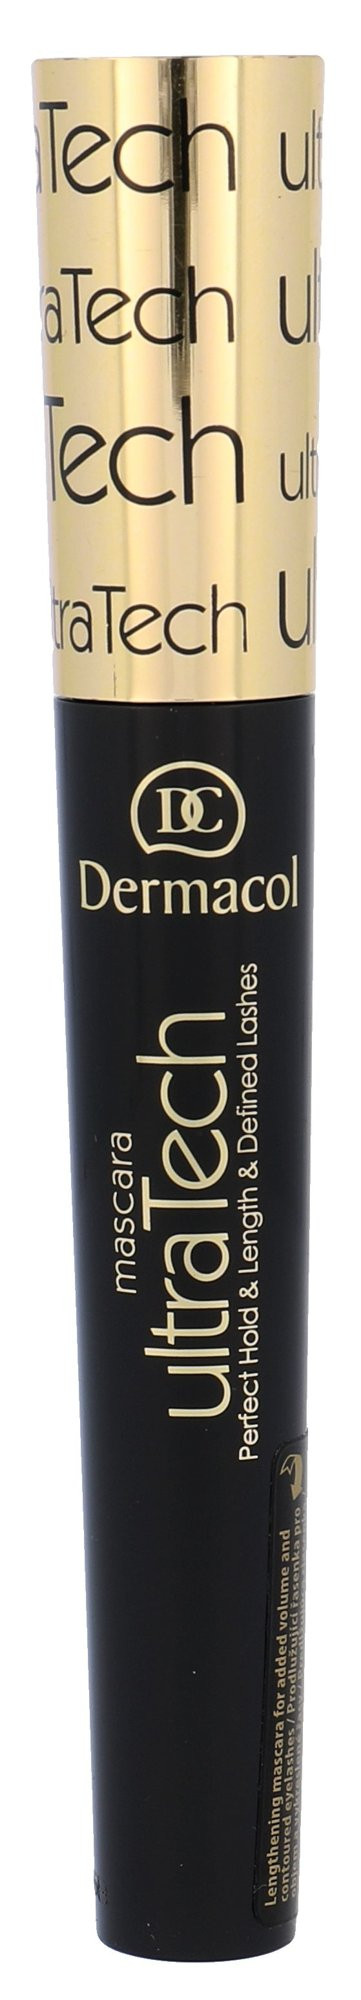 Dermacol Ultra Tech Cosmetic 10ml Black